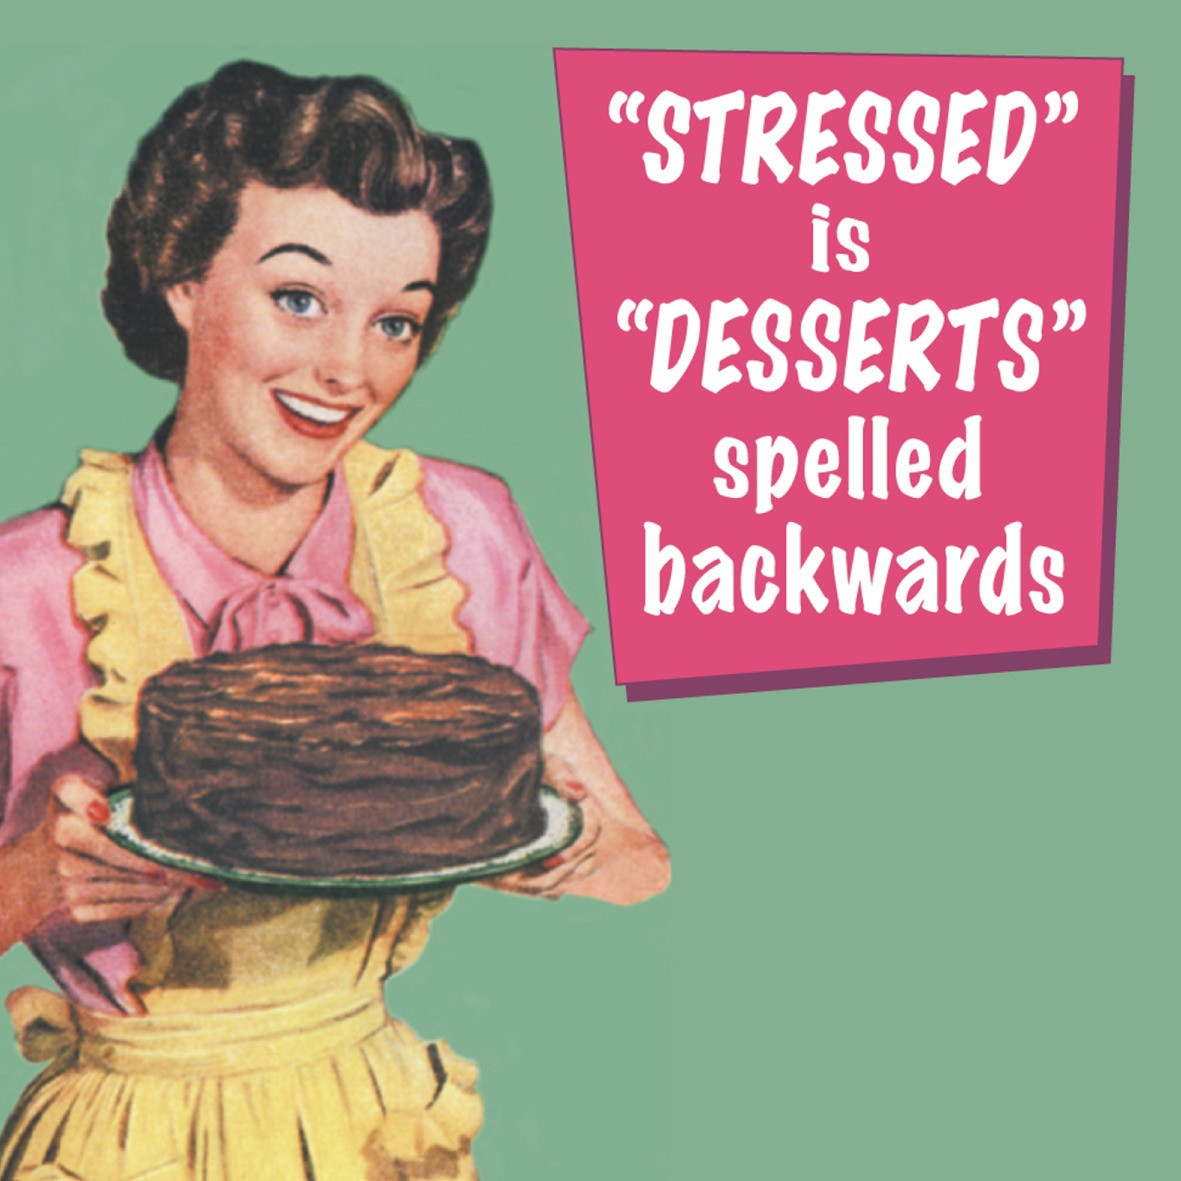 stresseating-pressuretobethin.jpg